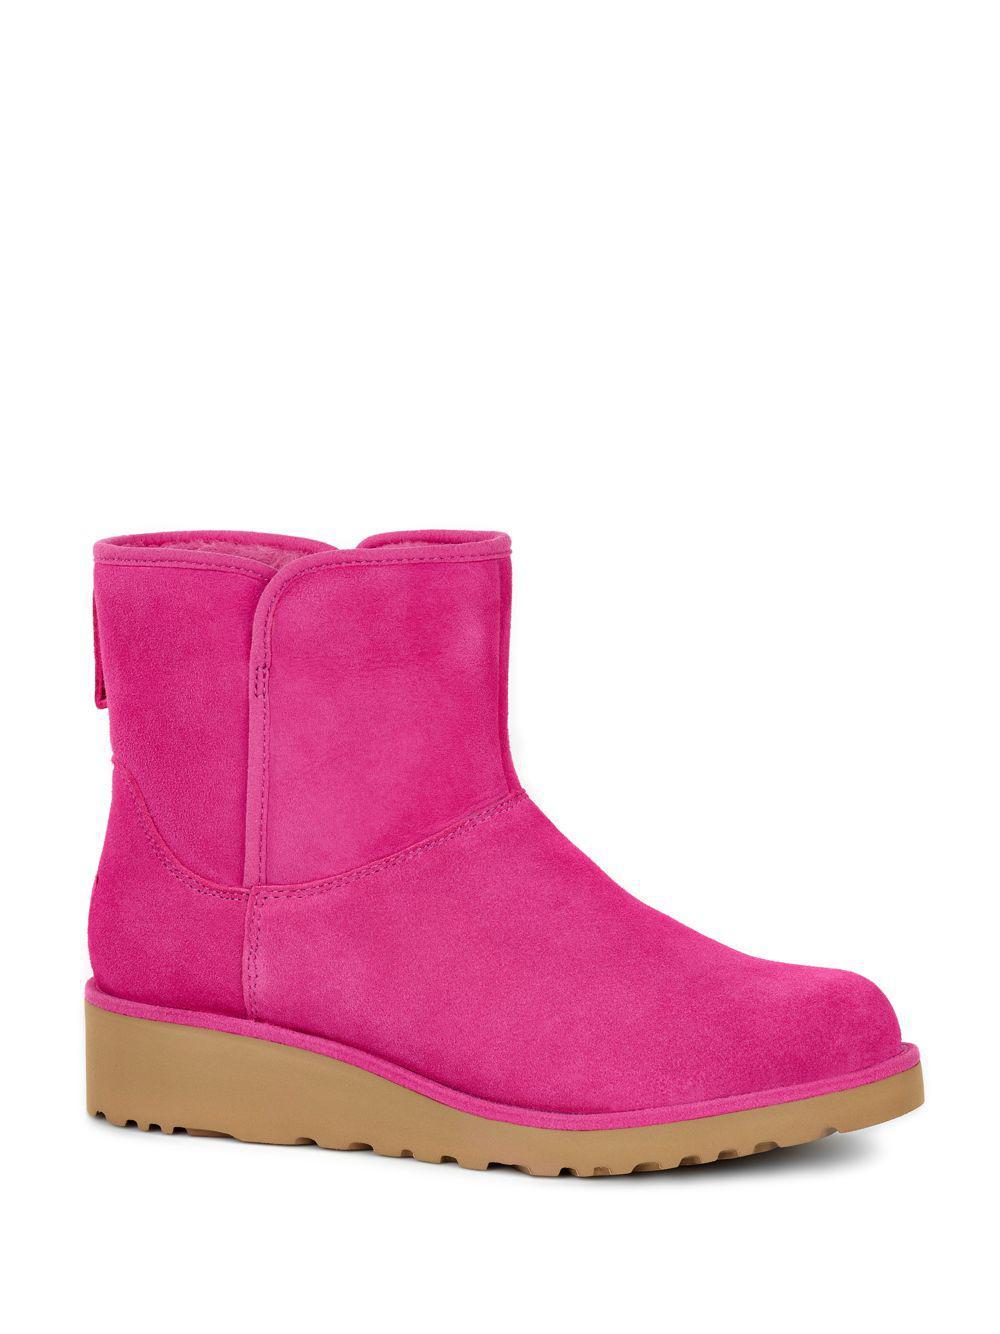 05cbfd78885 Lyst - UGG Kristin Slim Short Sheepskin Wedge Boots in Pink